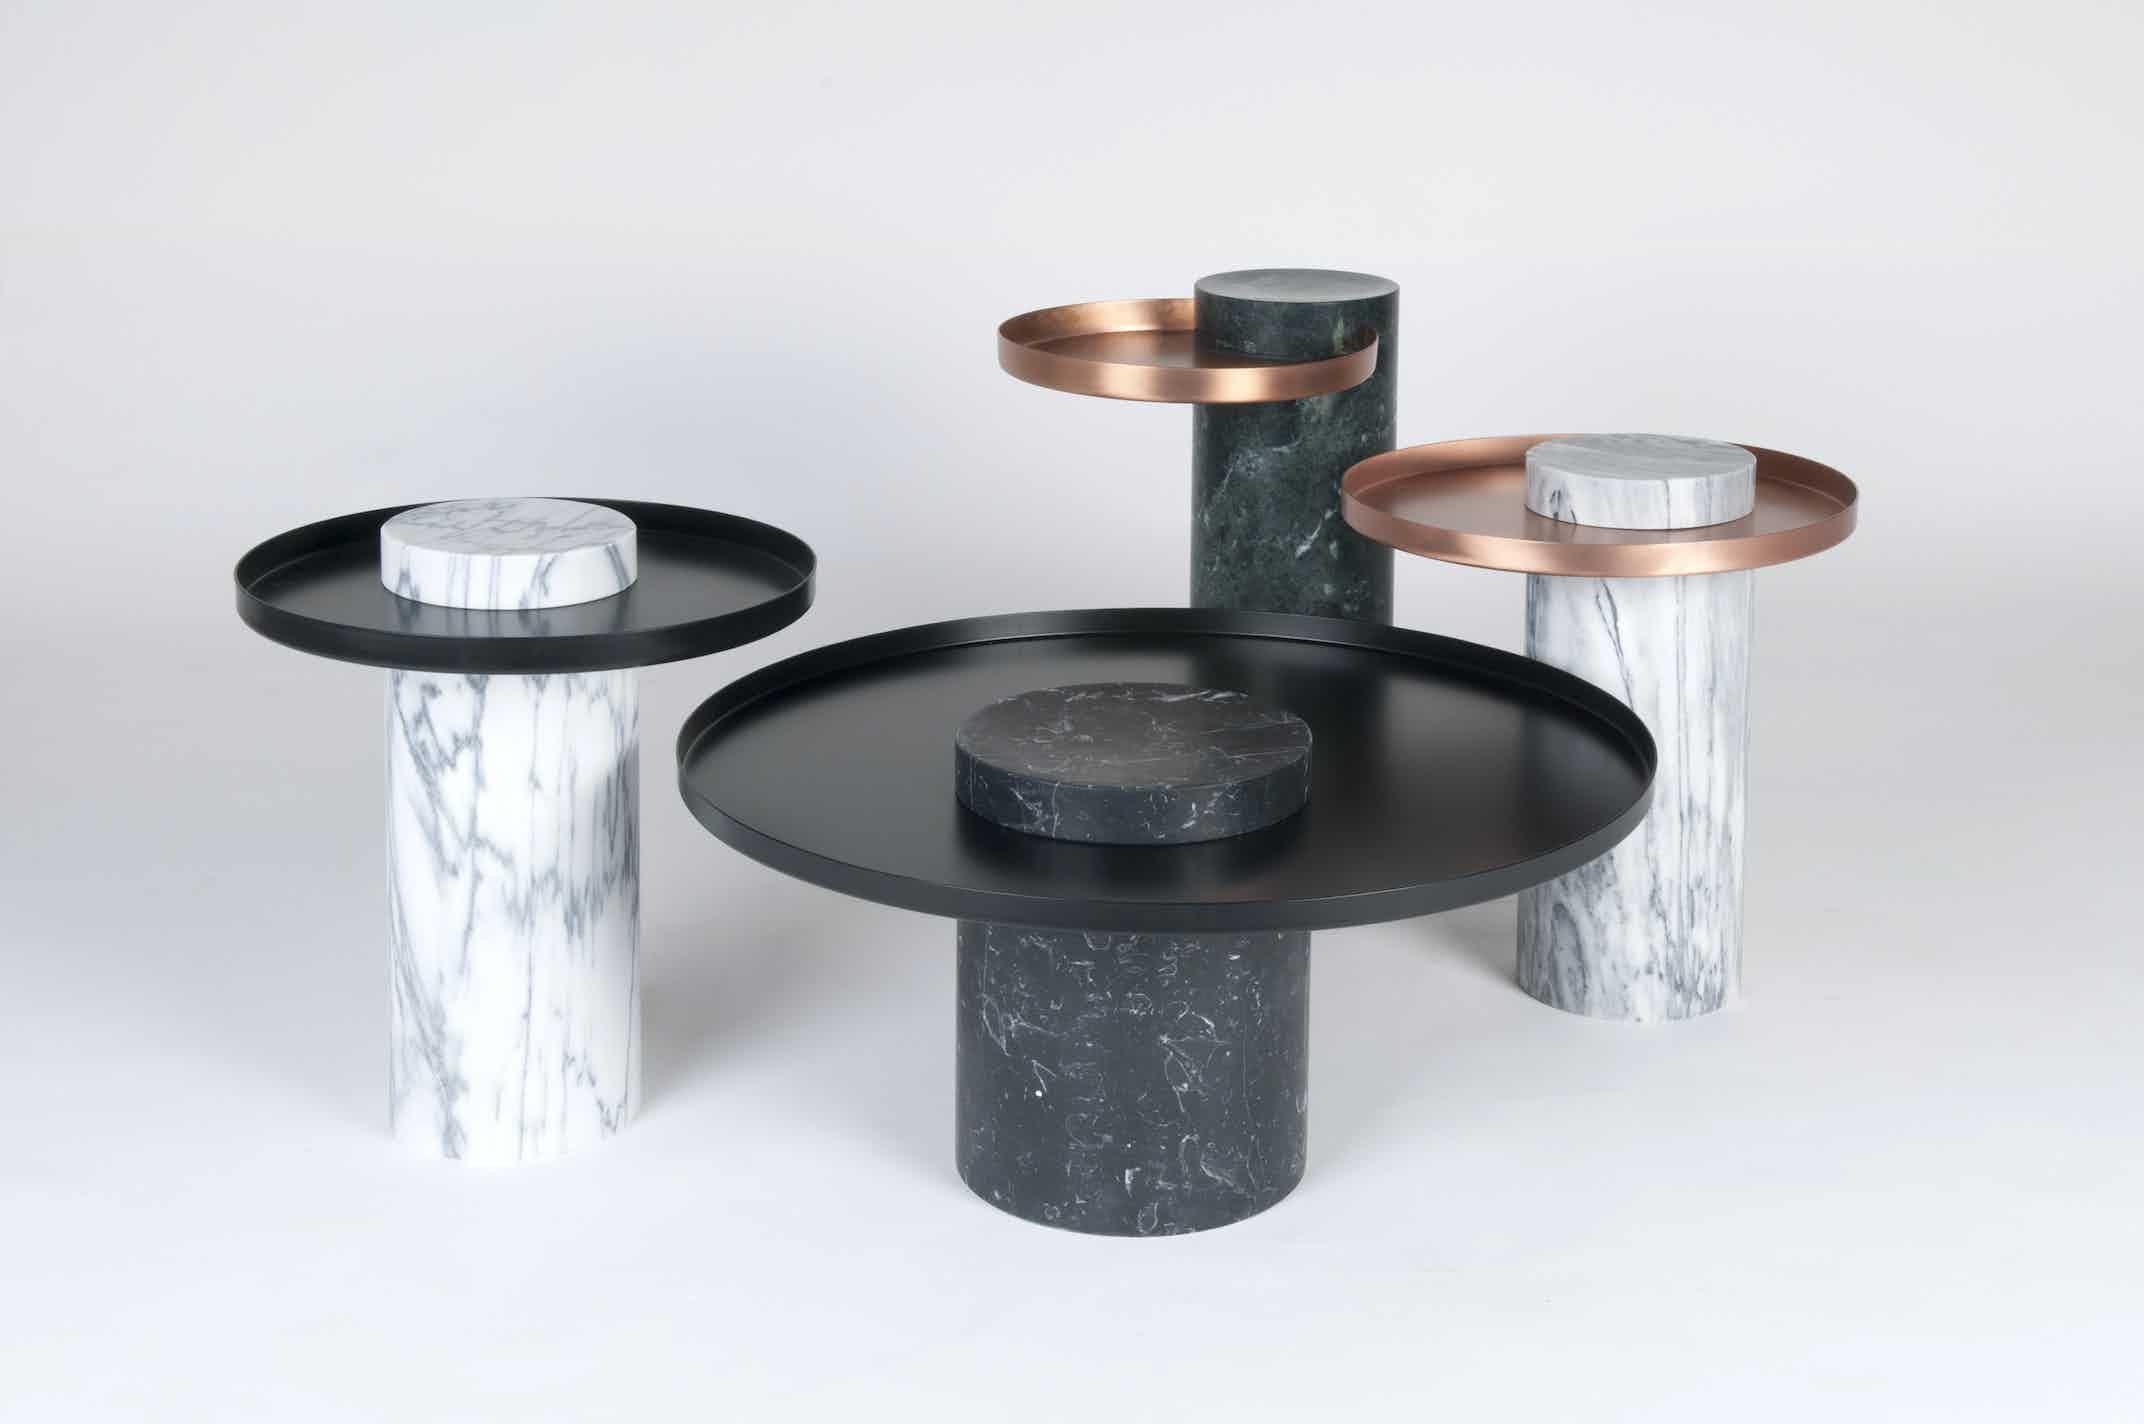 La-chance-furniture-salute-table-four-sizes-haute-living